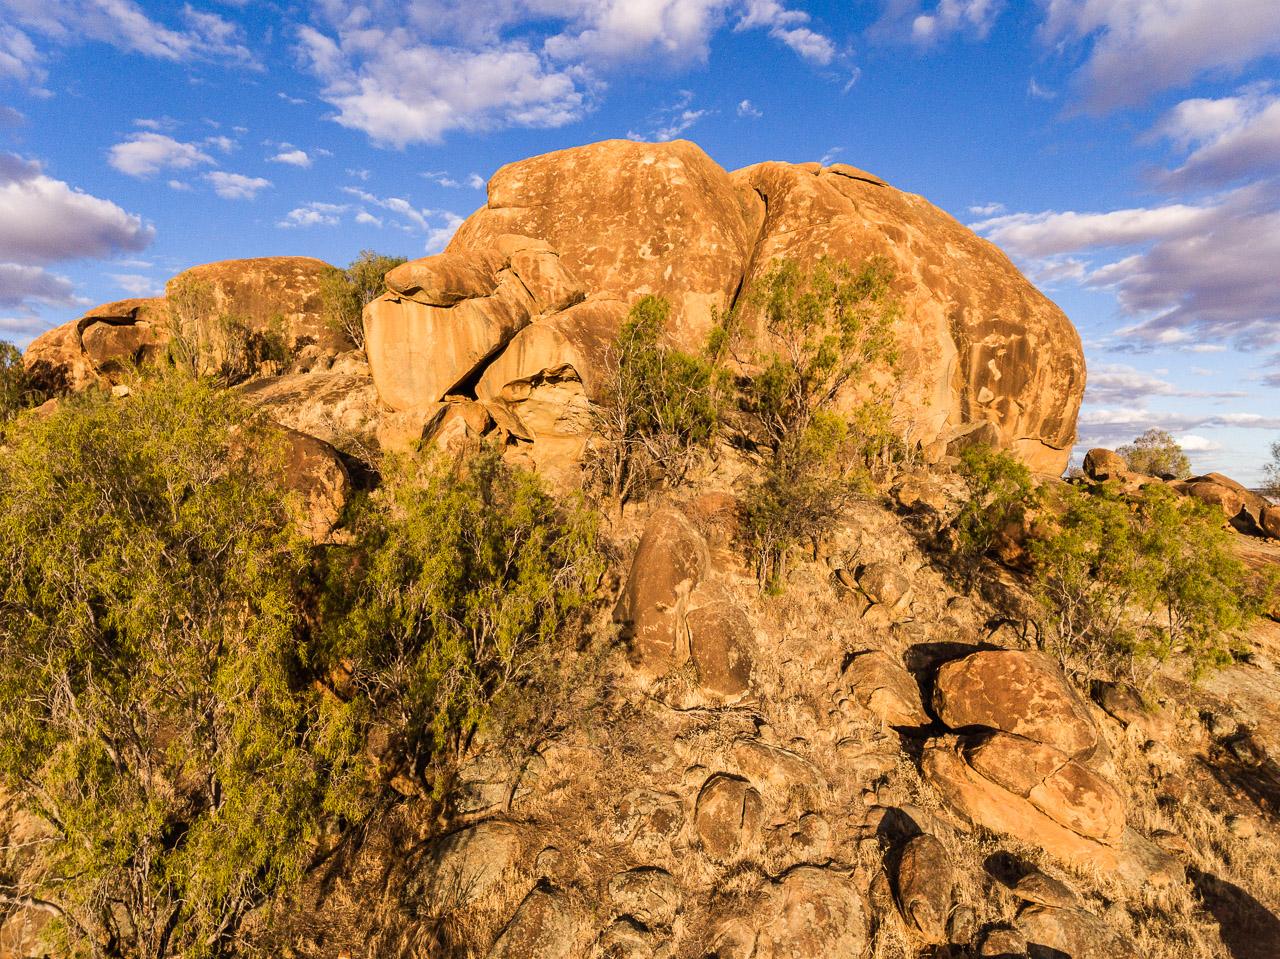 Eaglestone Rock, near Mukinbudin, at sunset